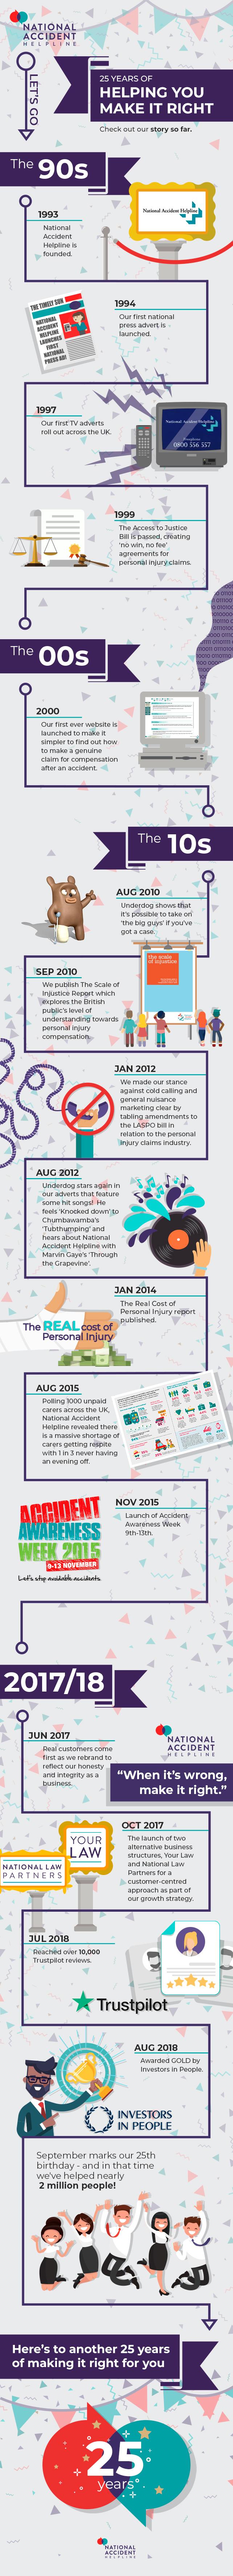 25 years infographic